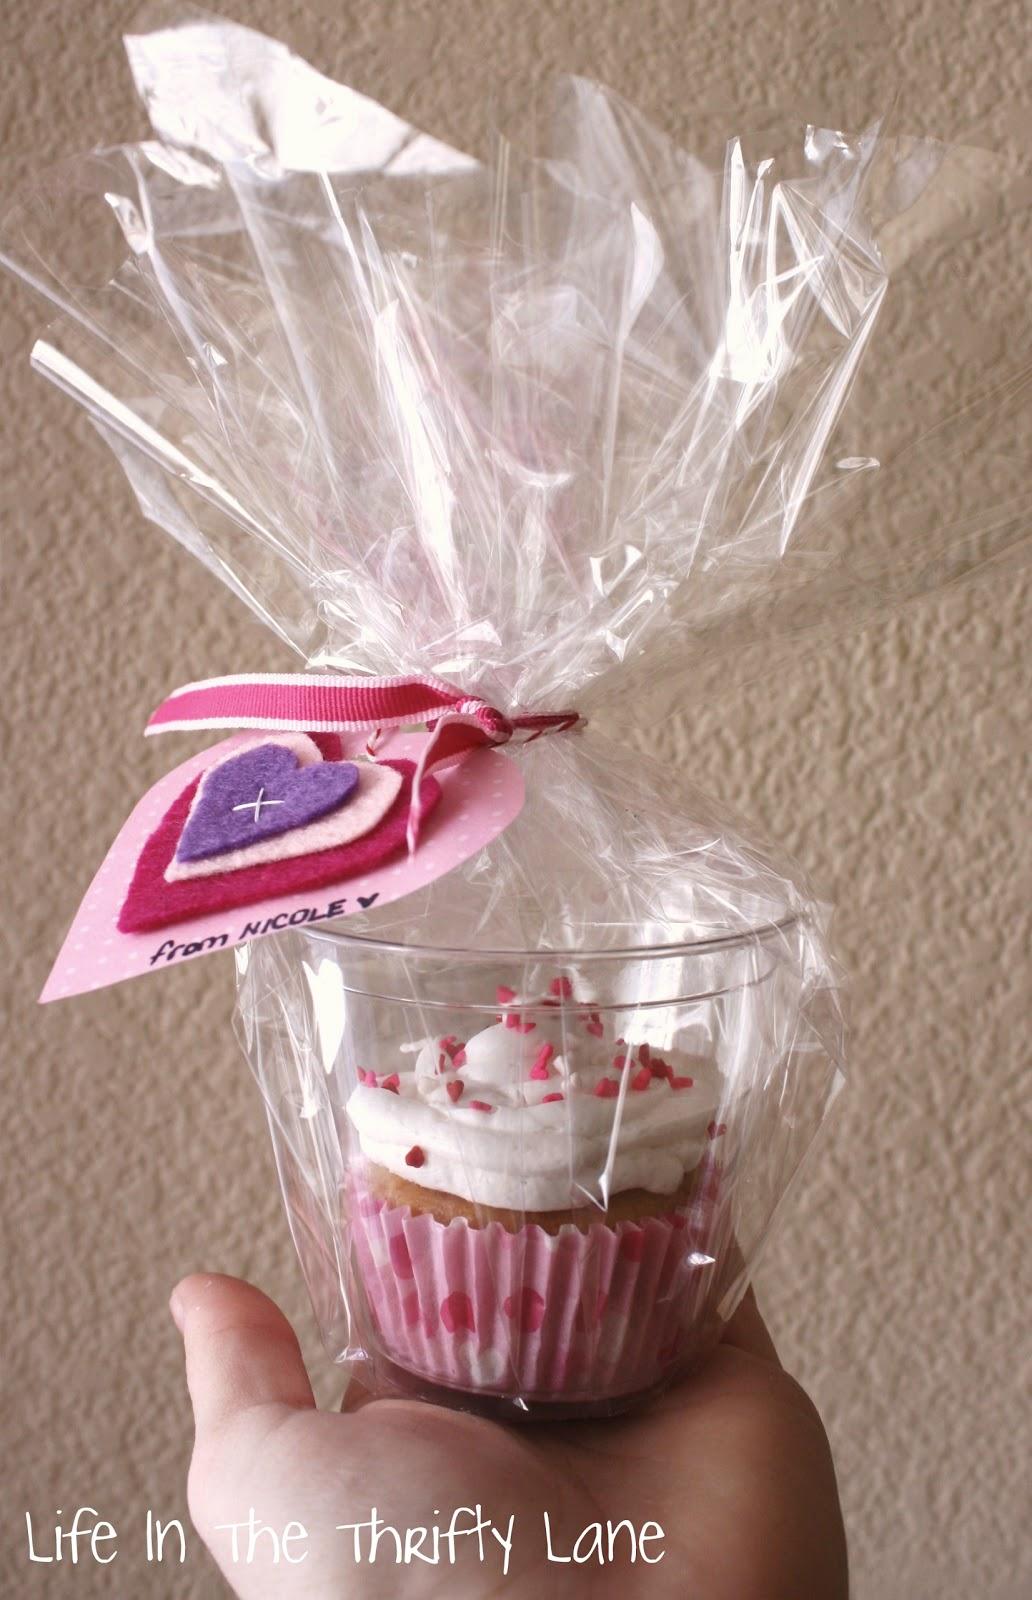 http://3.bp.blogspot.com/-KH-li7hHaSg/Tw9Nr8RSLgI/AAAAAAAAC_M/U2tJKNPZI7s/s1600/vday+cupcake1.jpg